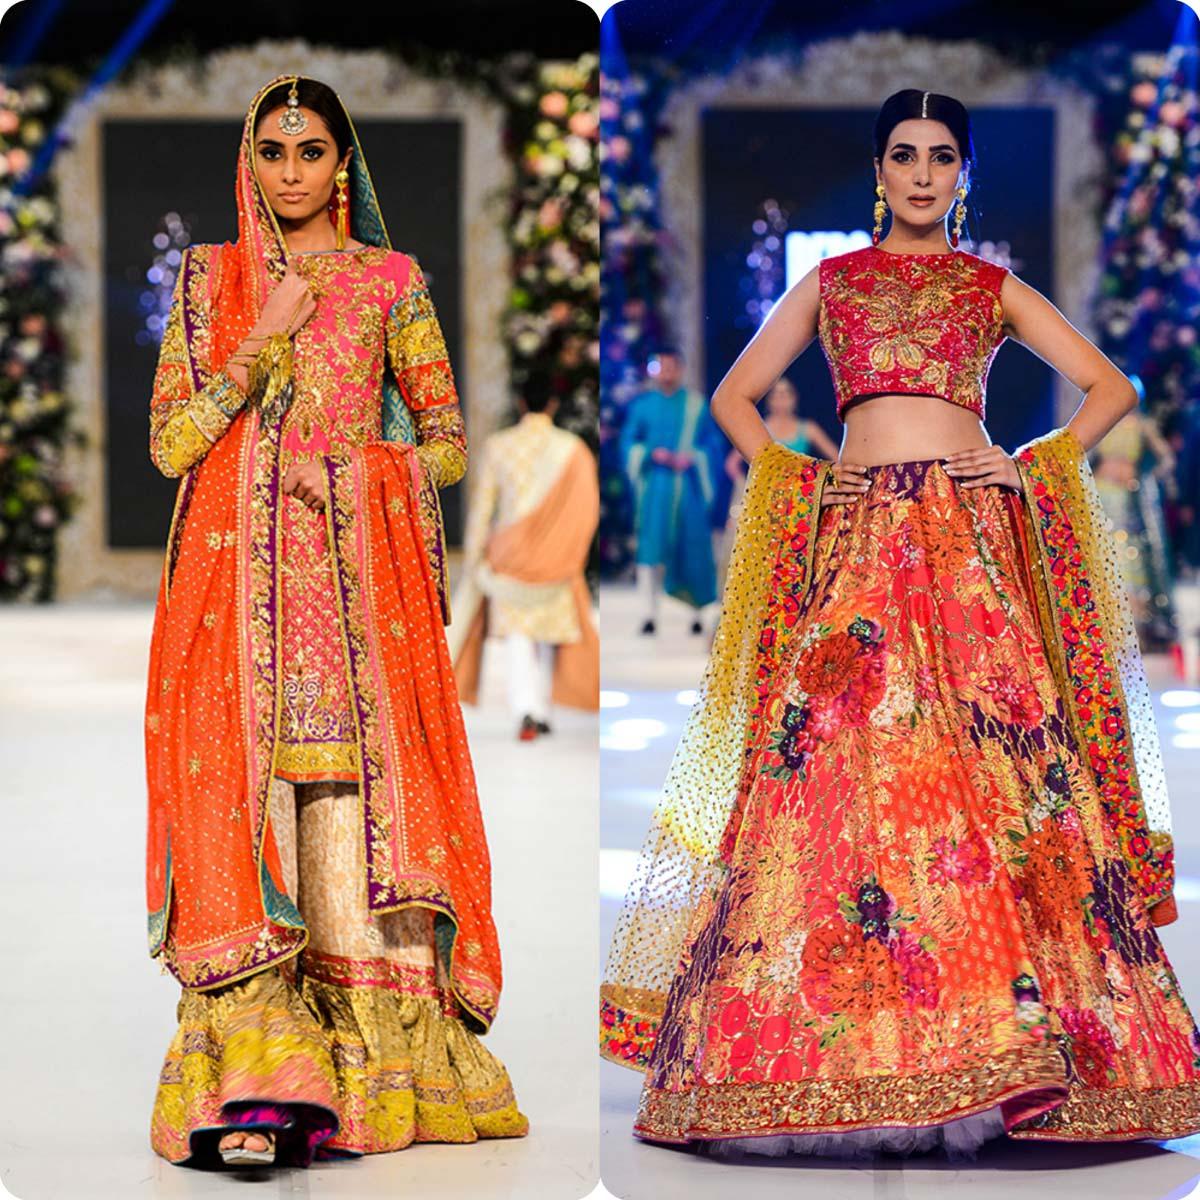 Nomi Ansari Bridal Wear Collection Ft-Junaid Khan & Maya Ali 2016-17 (8)